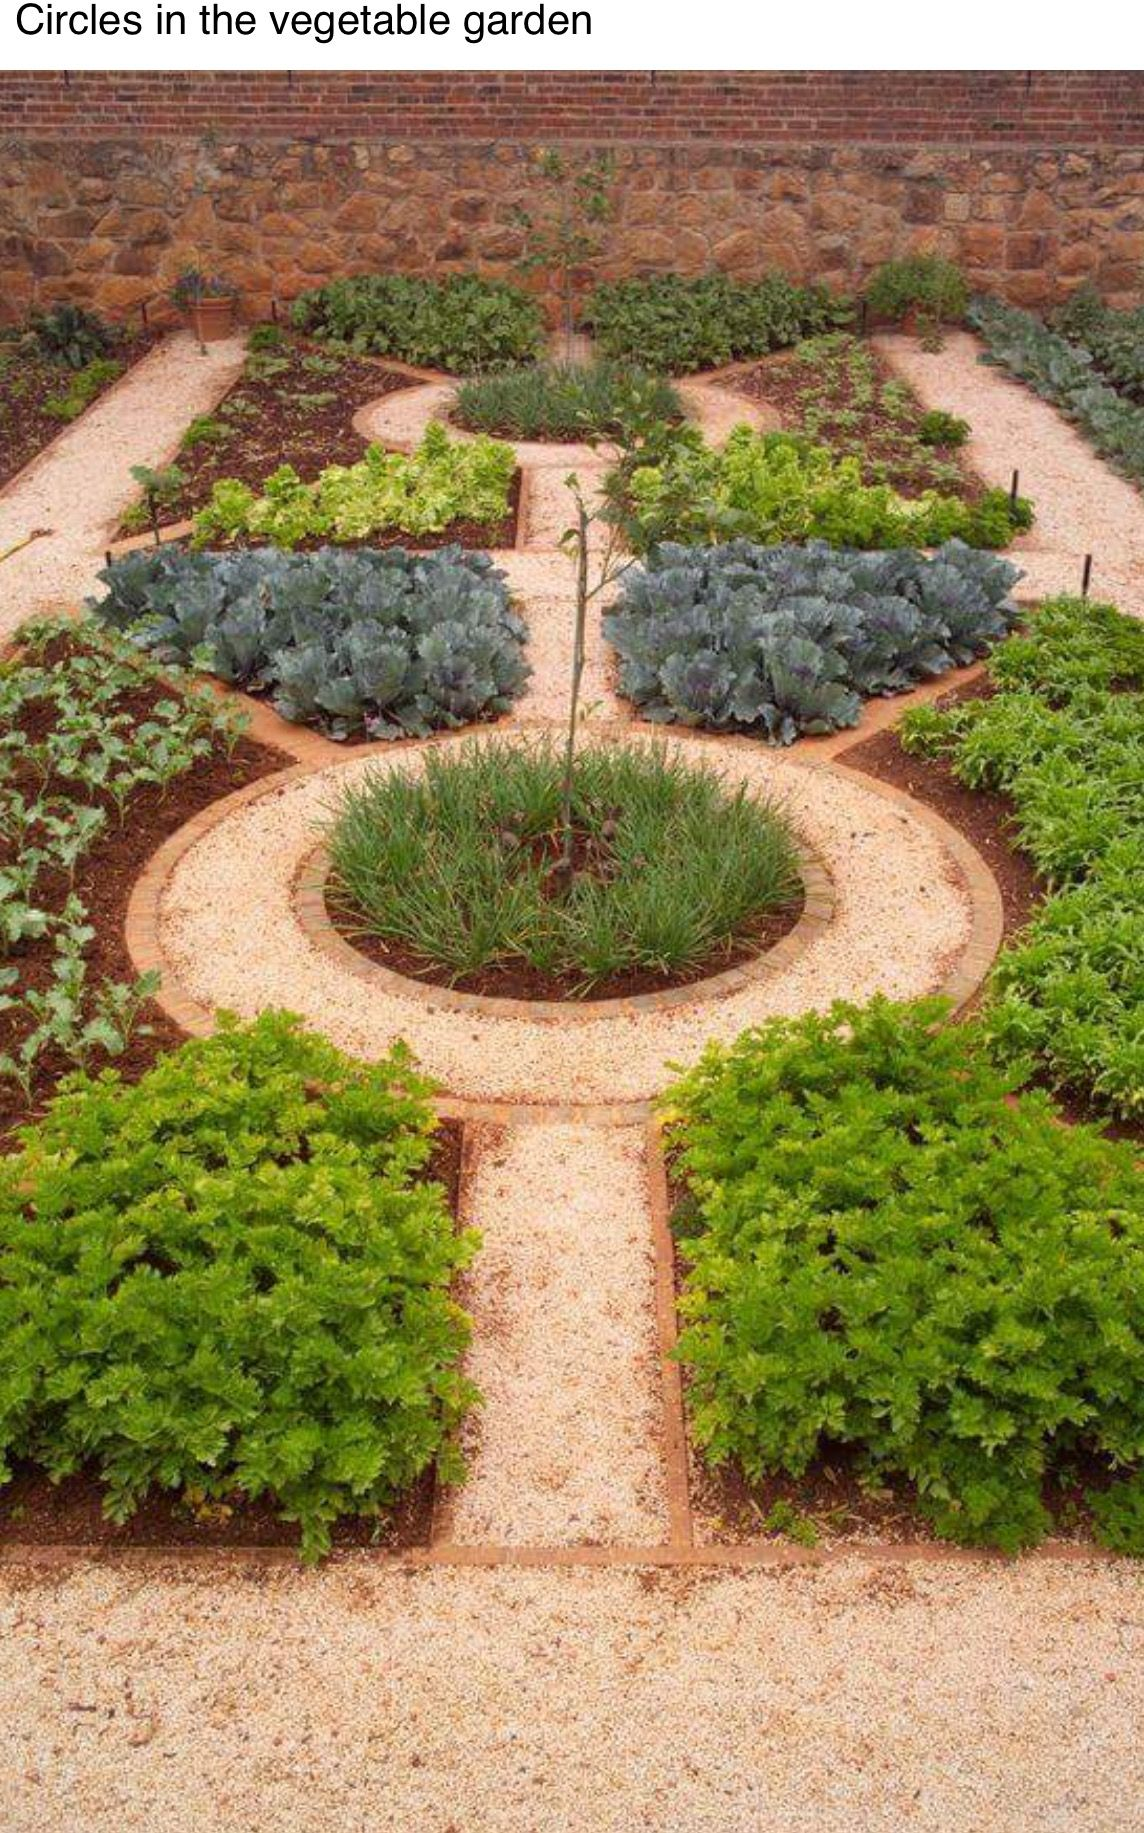 Pin by Pam Guite on Gardening | Herb garden design ...